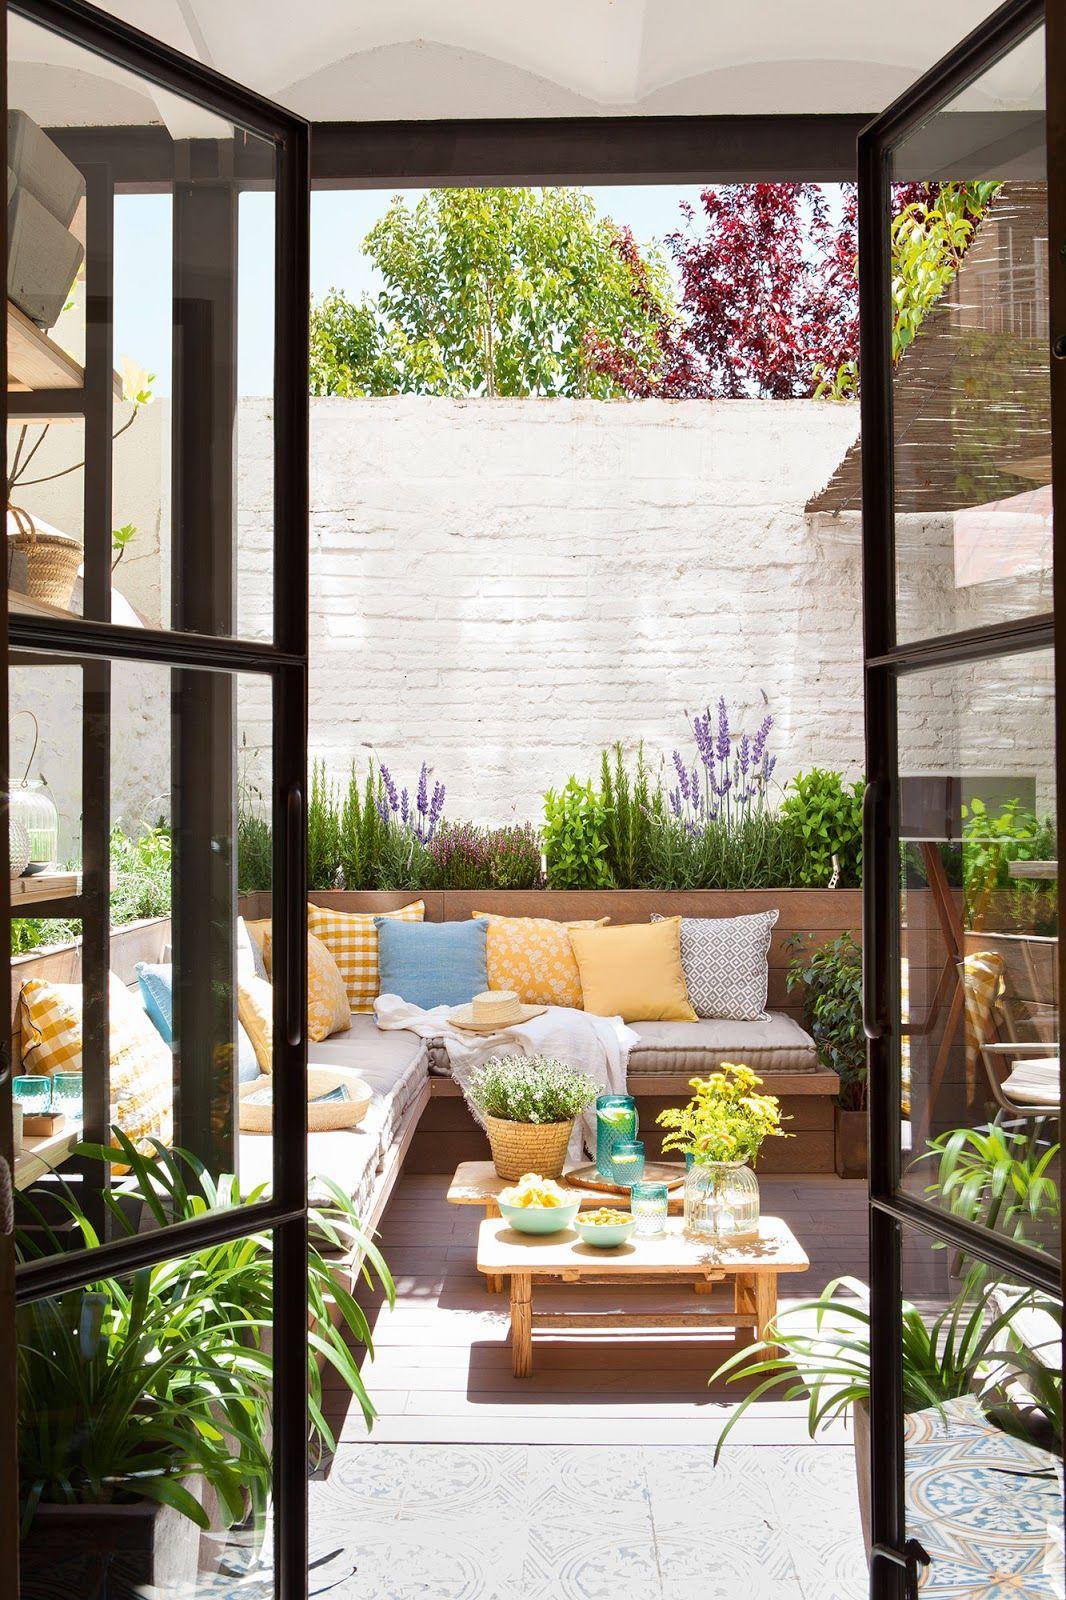 terrasse jardin terrasses le jardin petits jardins futur plantes hiver bricolage balcon grill